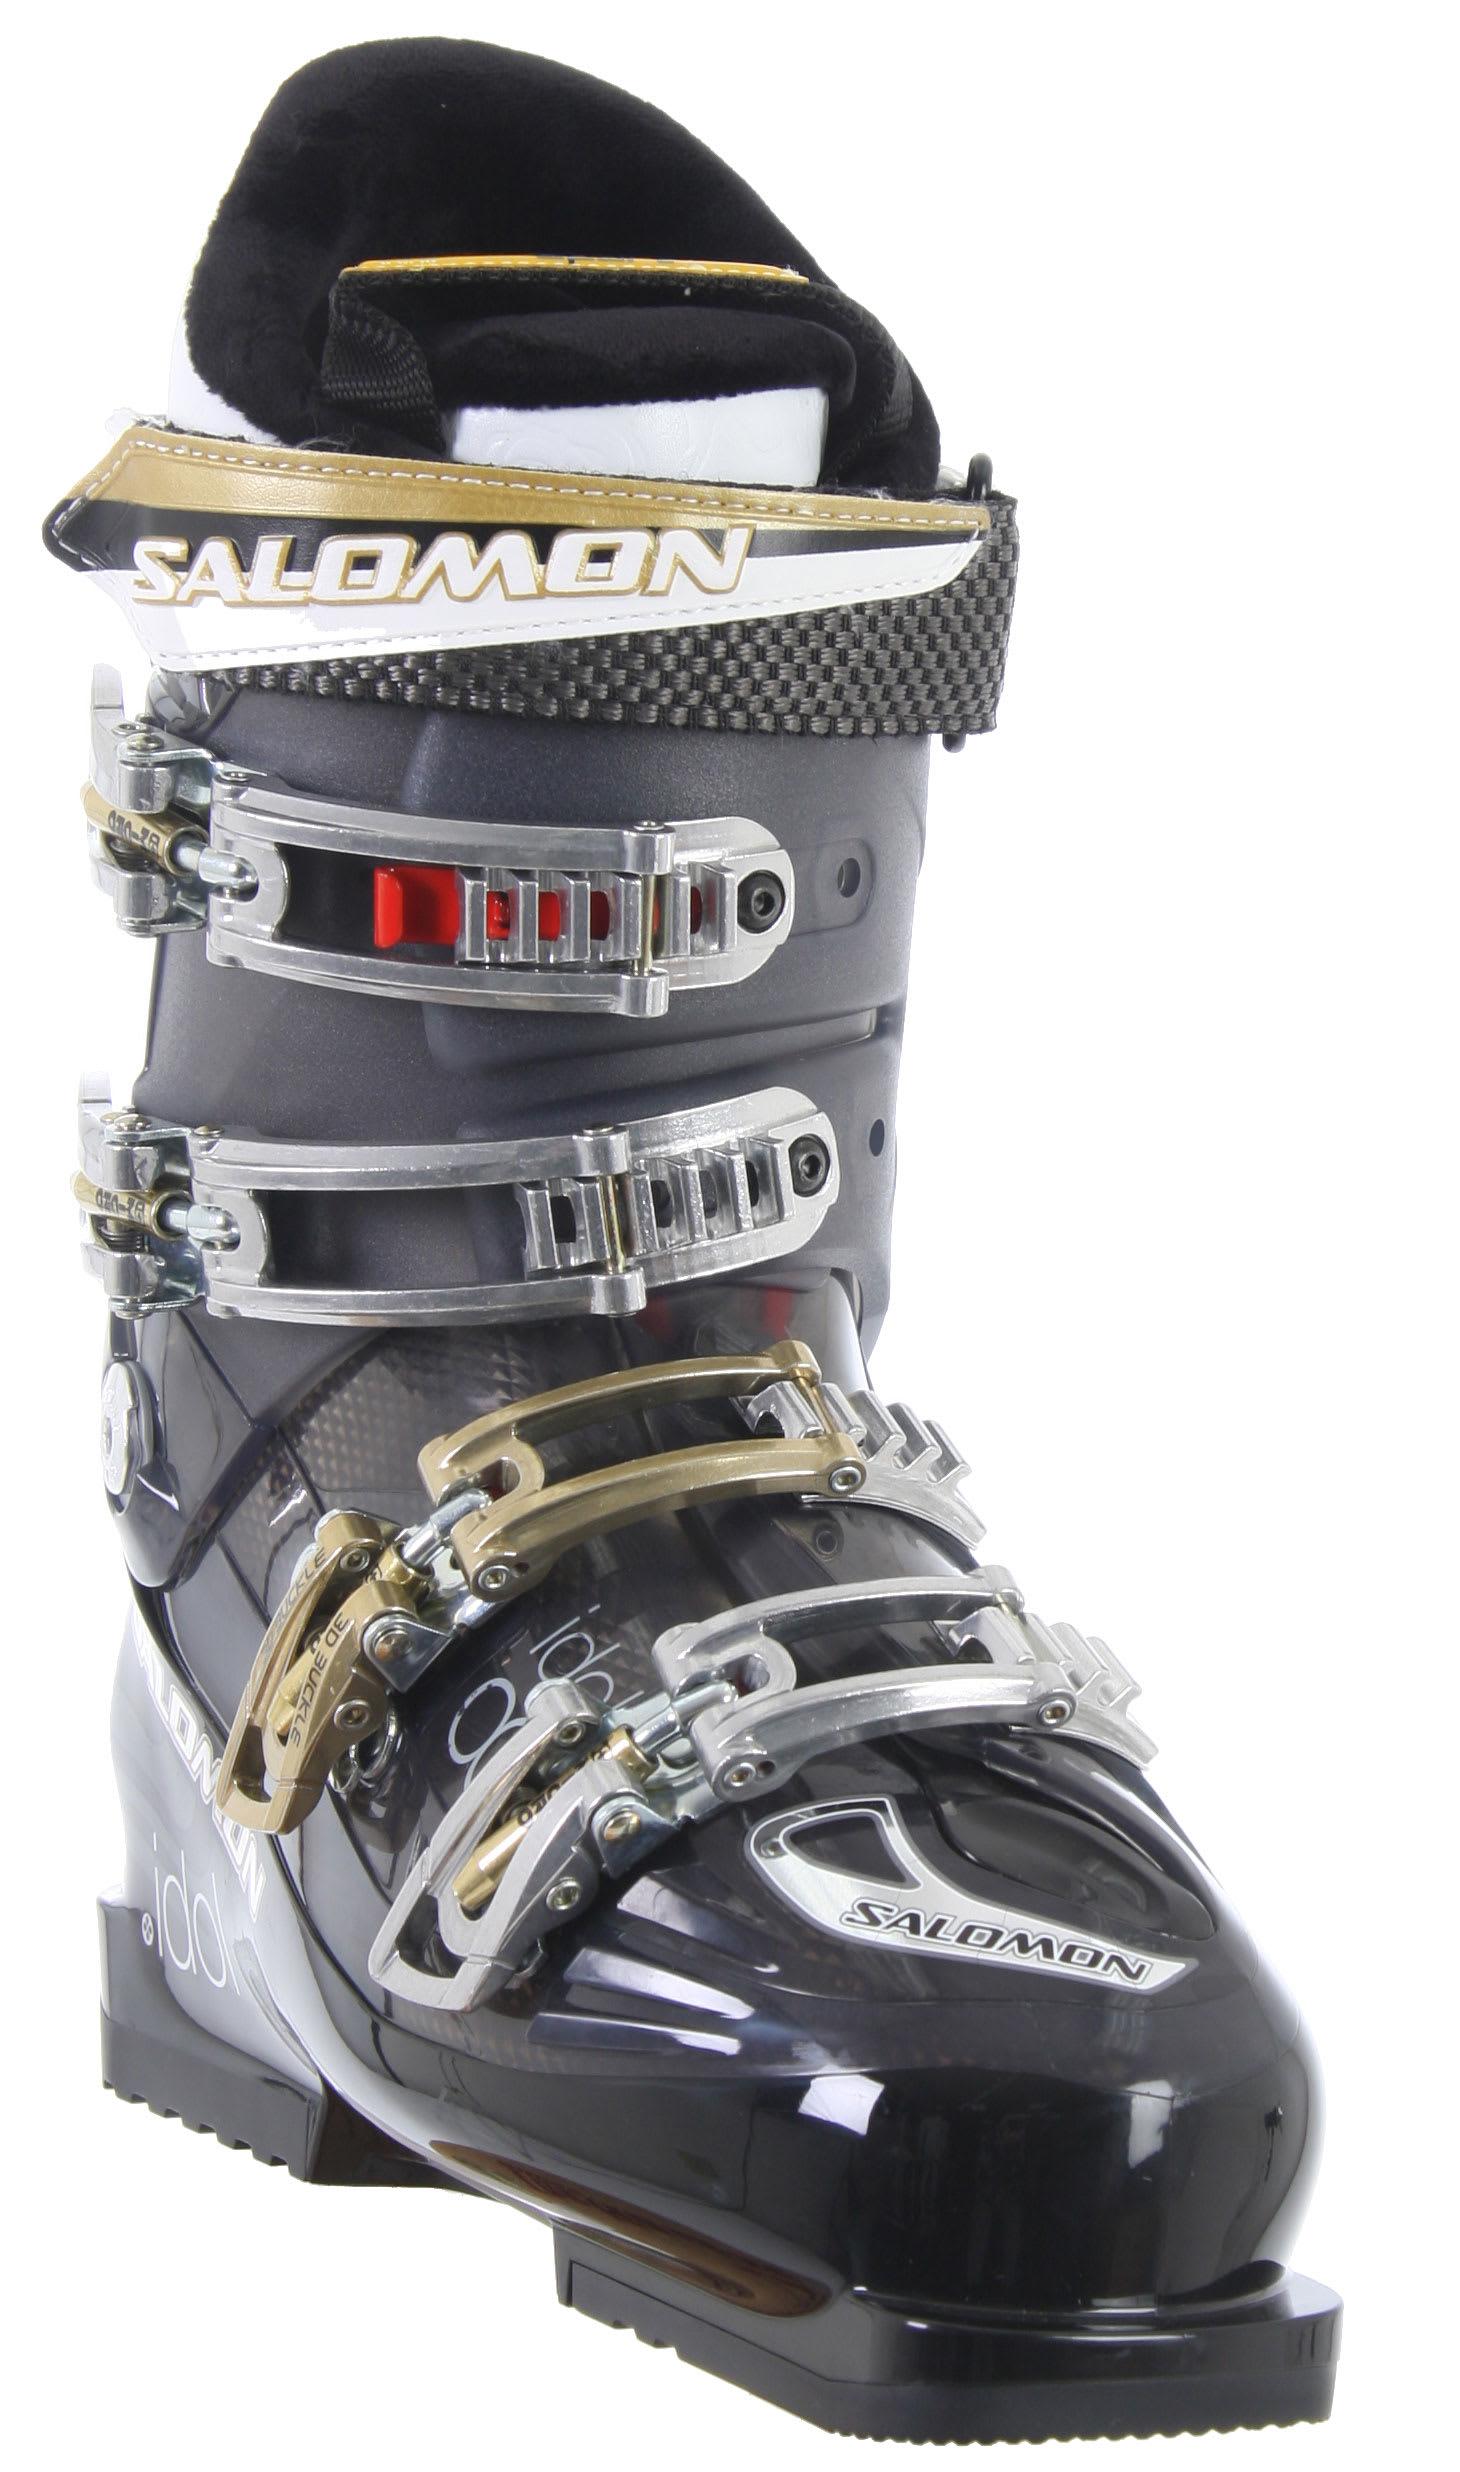 Salomon Idol x75 Ski Boots, MP 26.5, UK 8: Amazon.co.uk